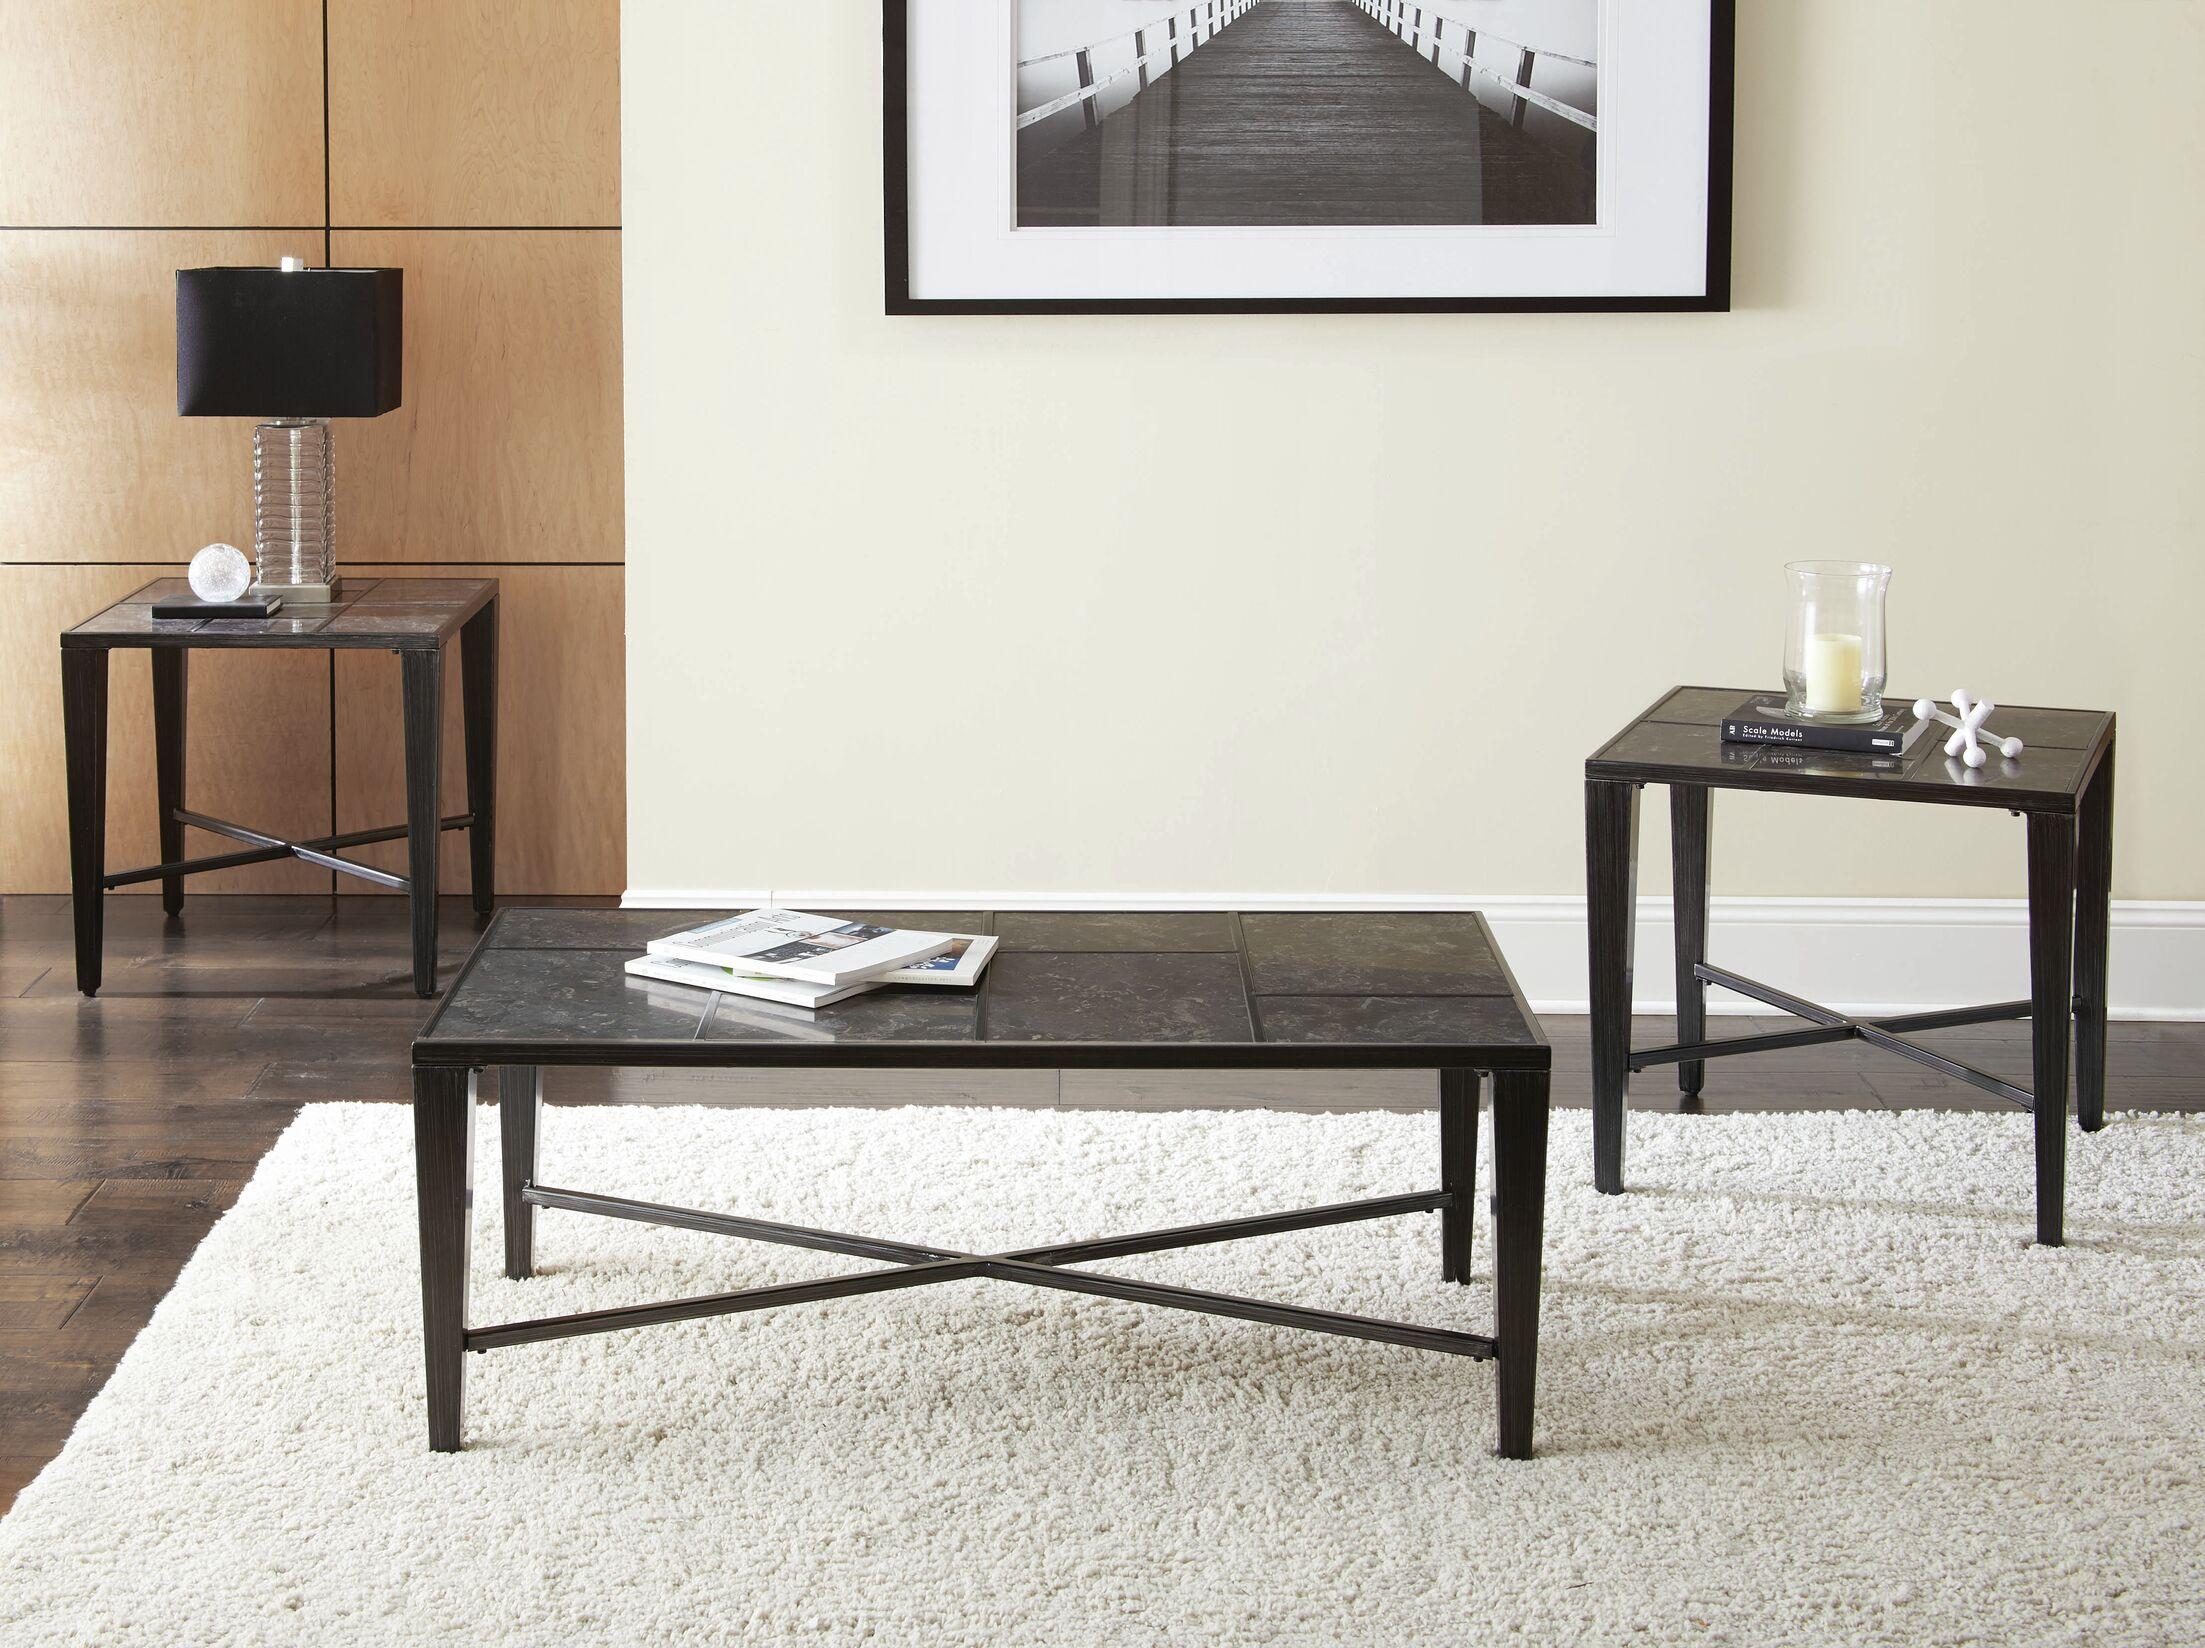 Hoa 3 Piece Coffee Table Set